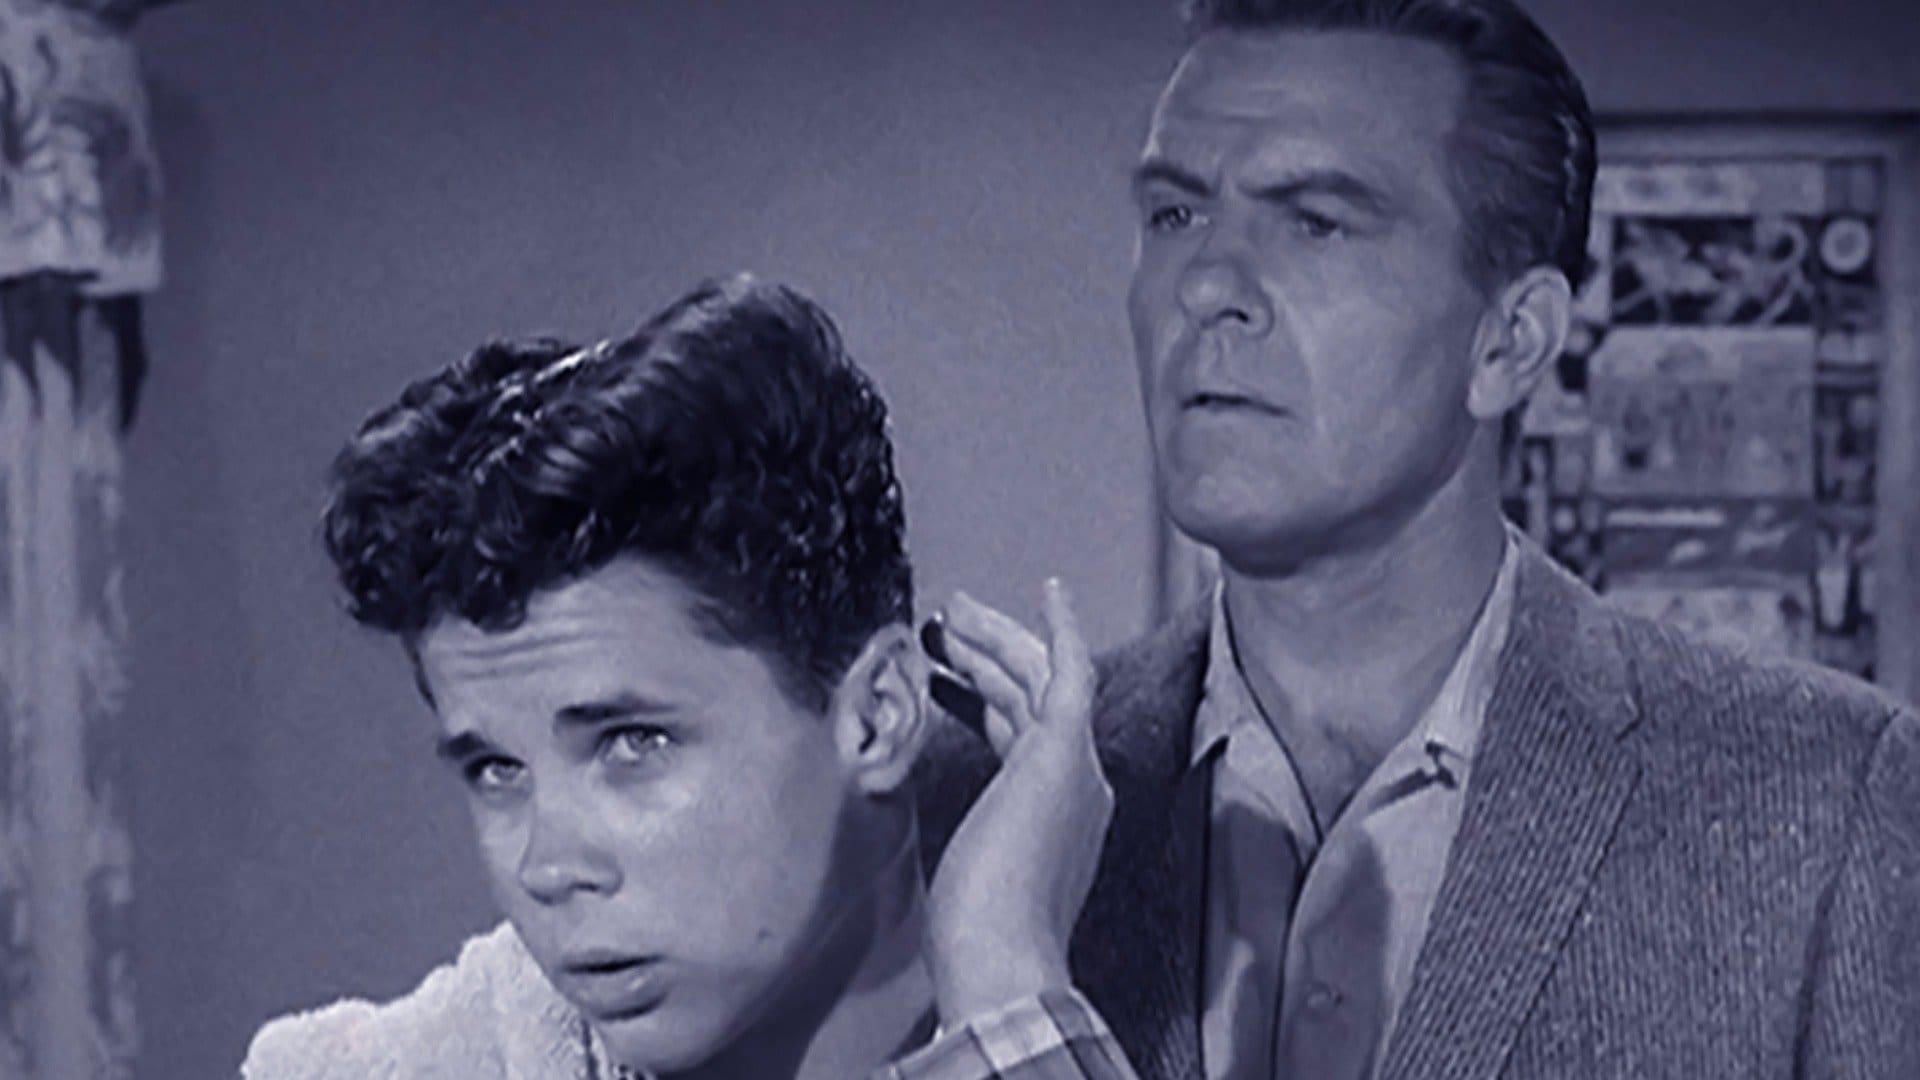 Wally's Haircomb